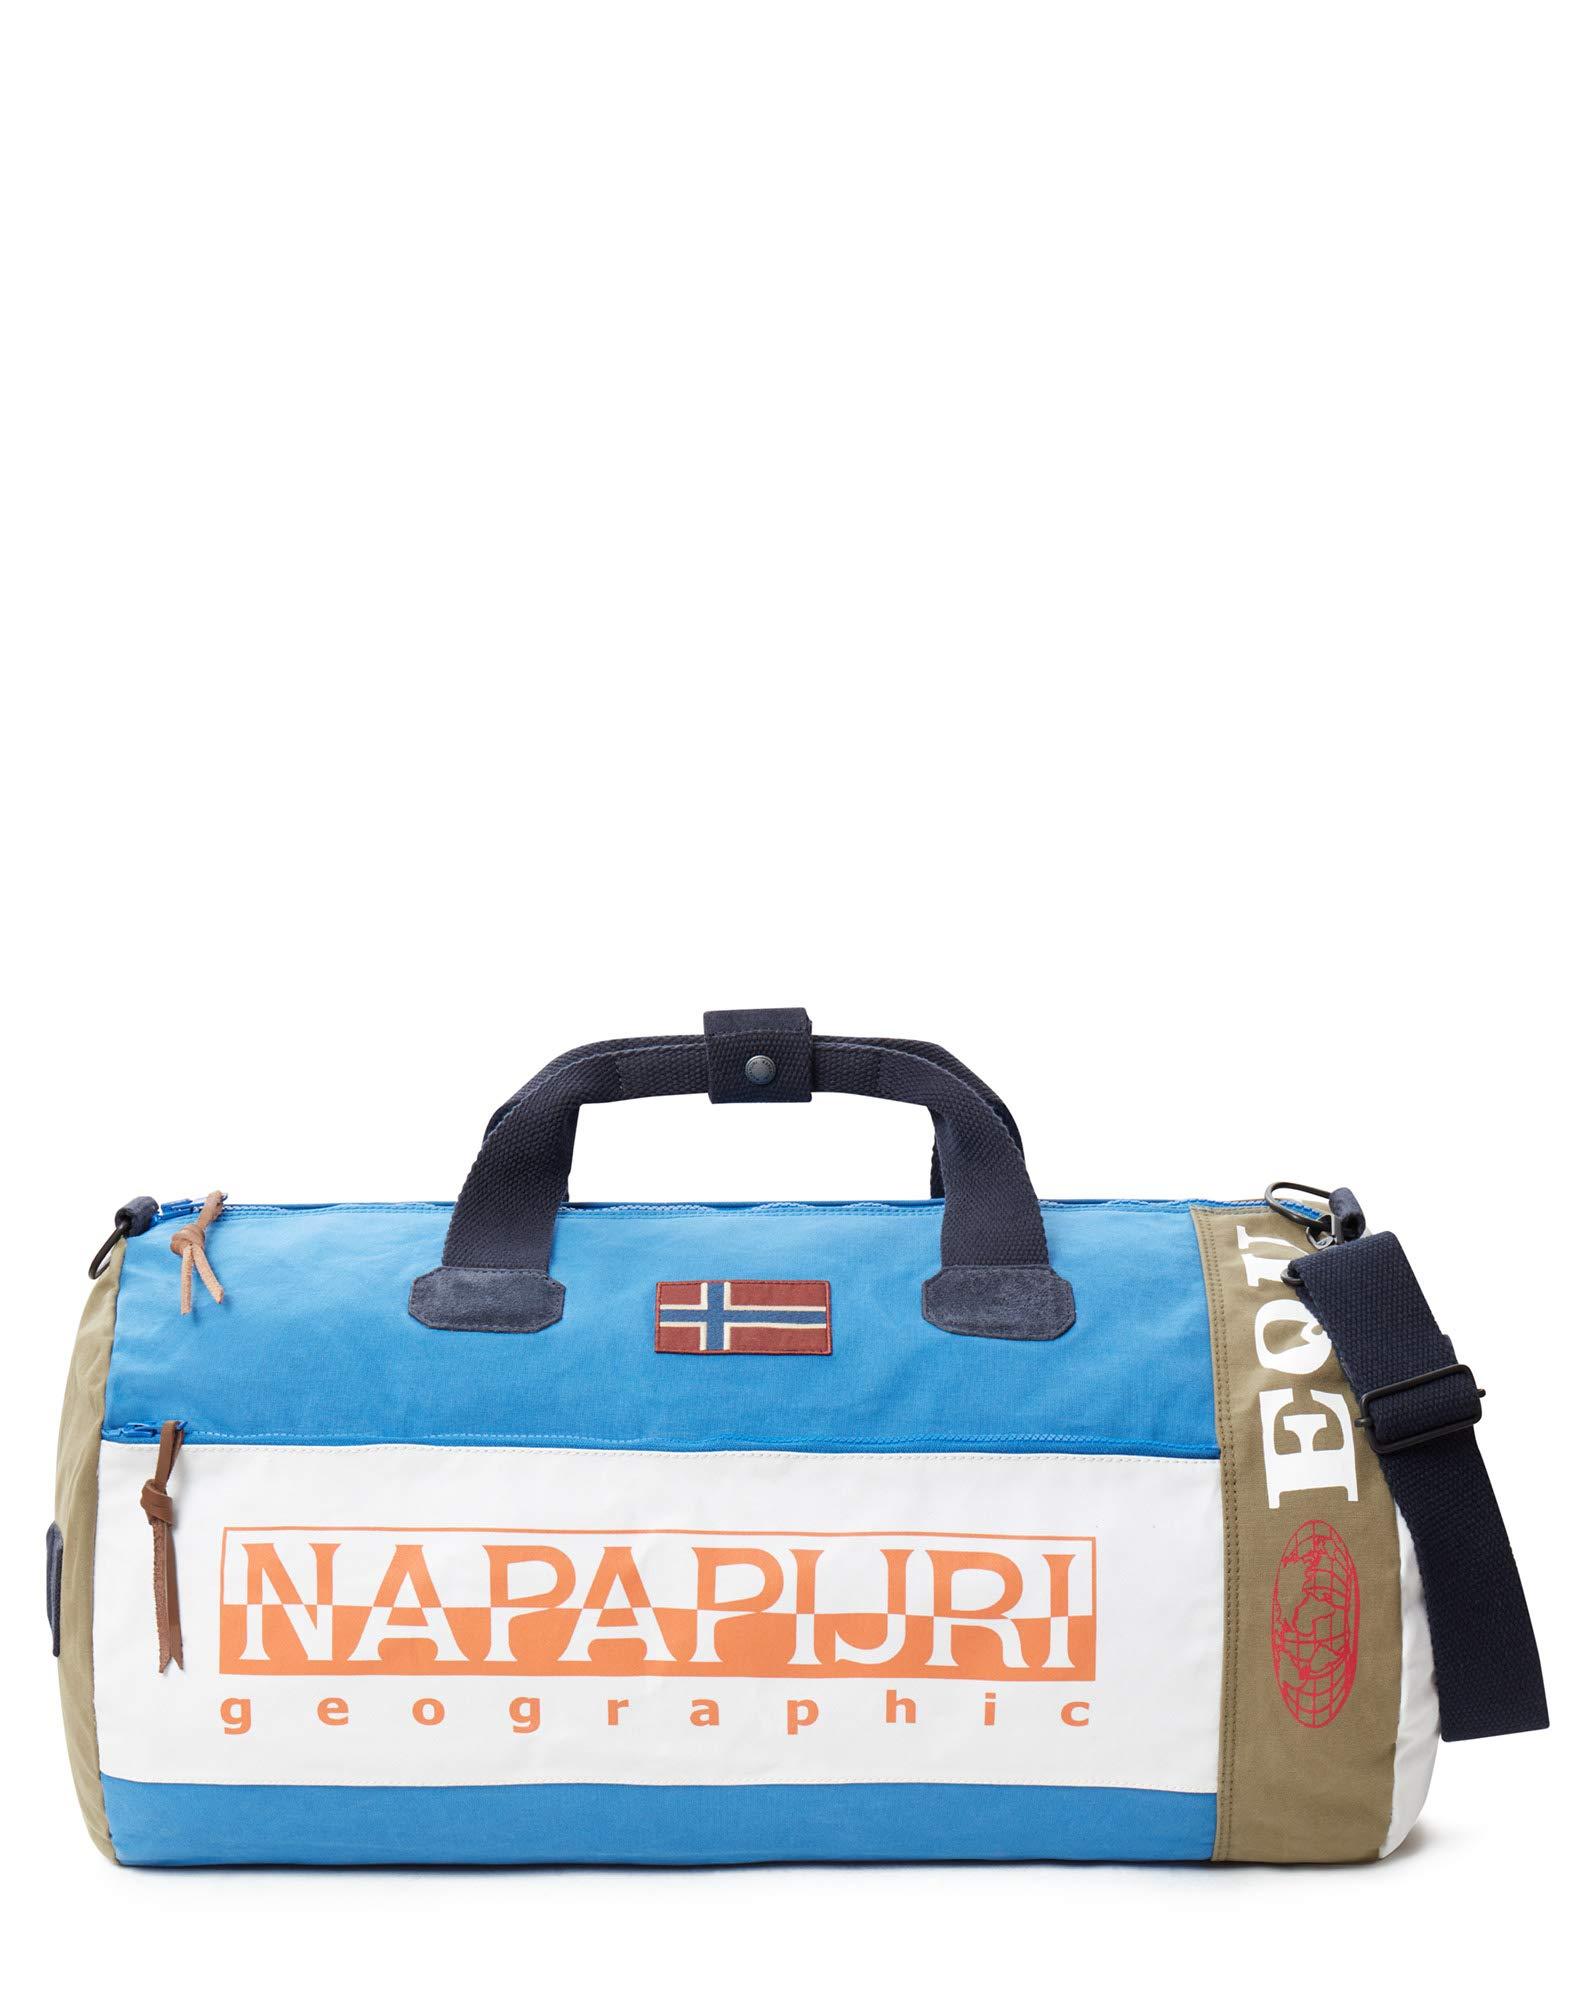 Napapijri-SAROV-1-Reisetasche-60-cm-57-Liter-Sarov-1-Skydiver-Blue